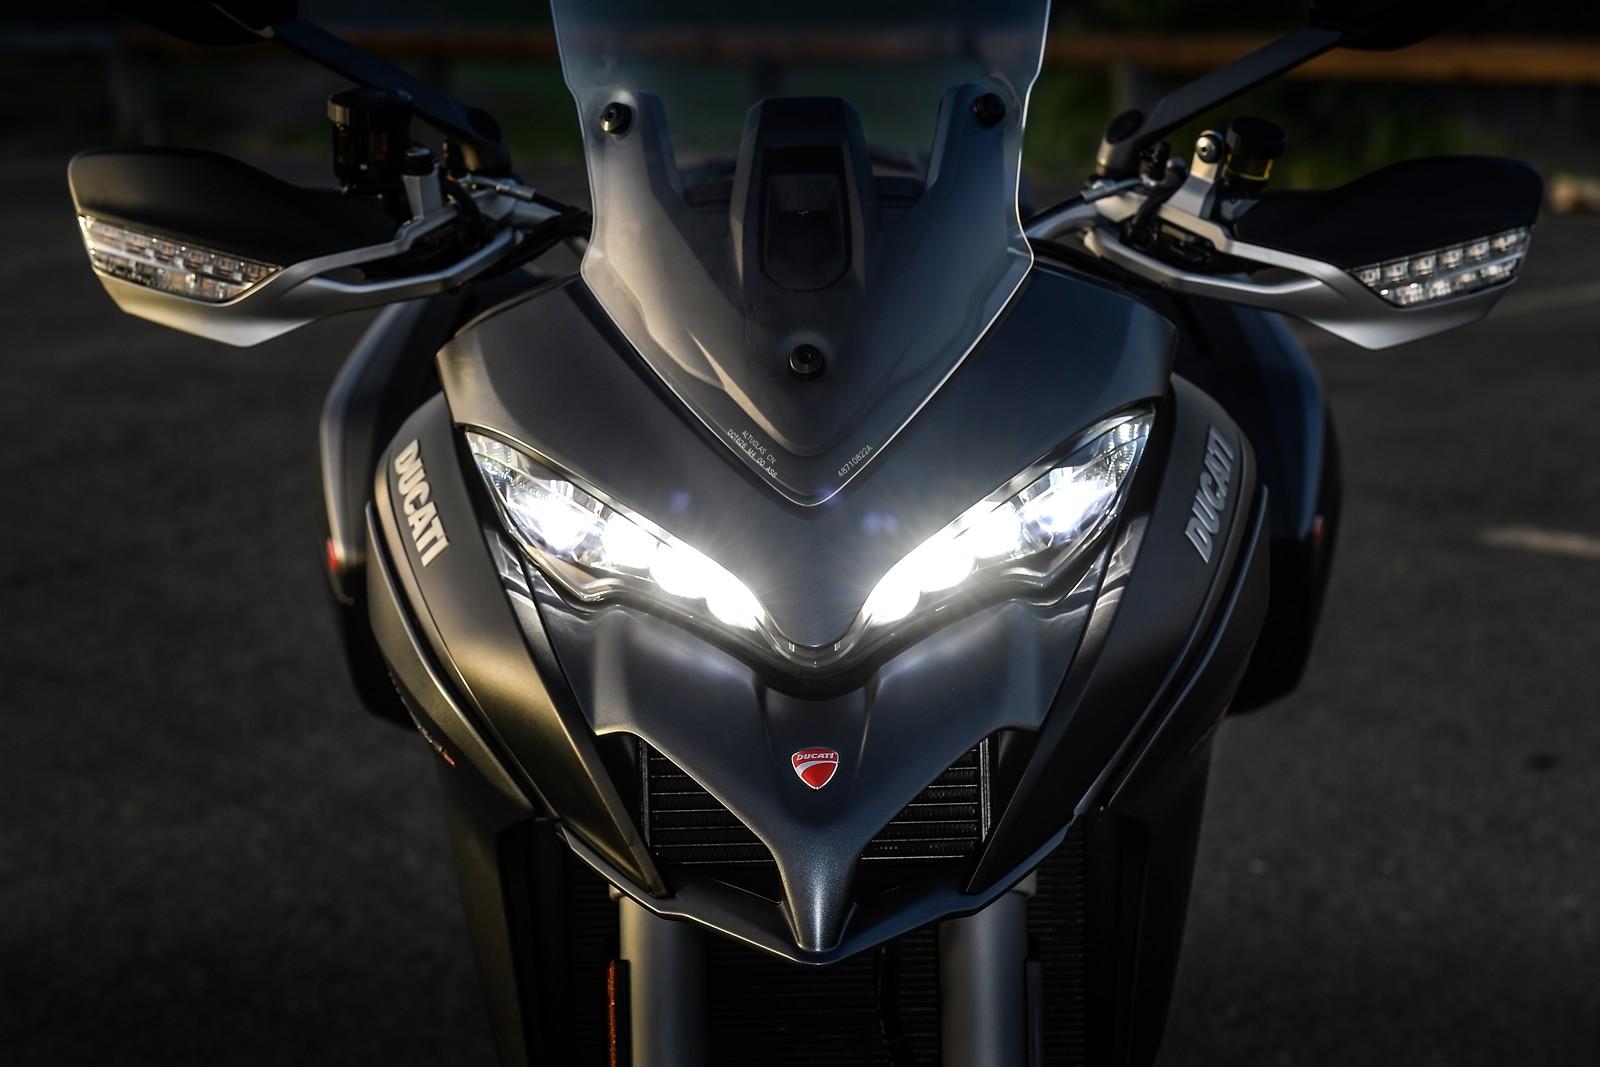 Foto de Ducati Multistrada 1260 2018 (13/62)